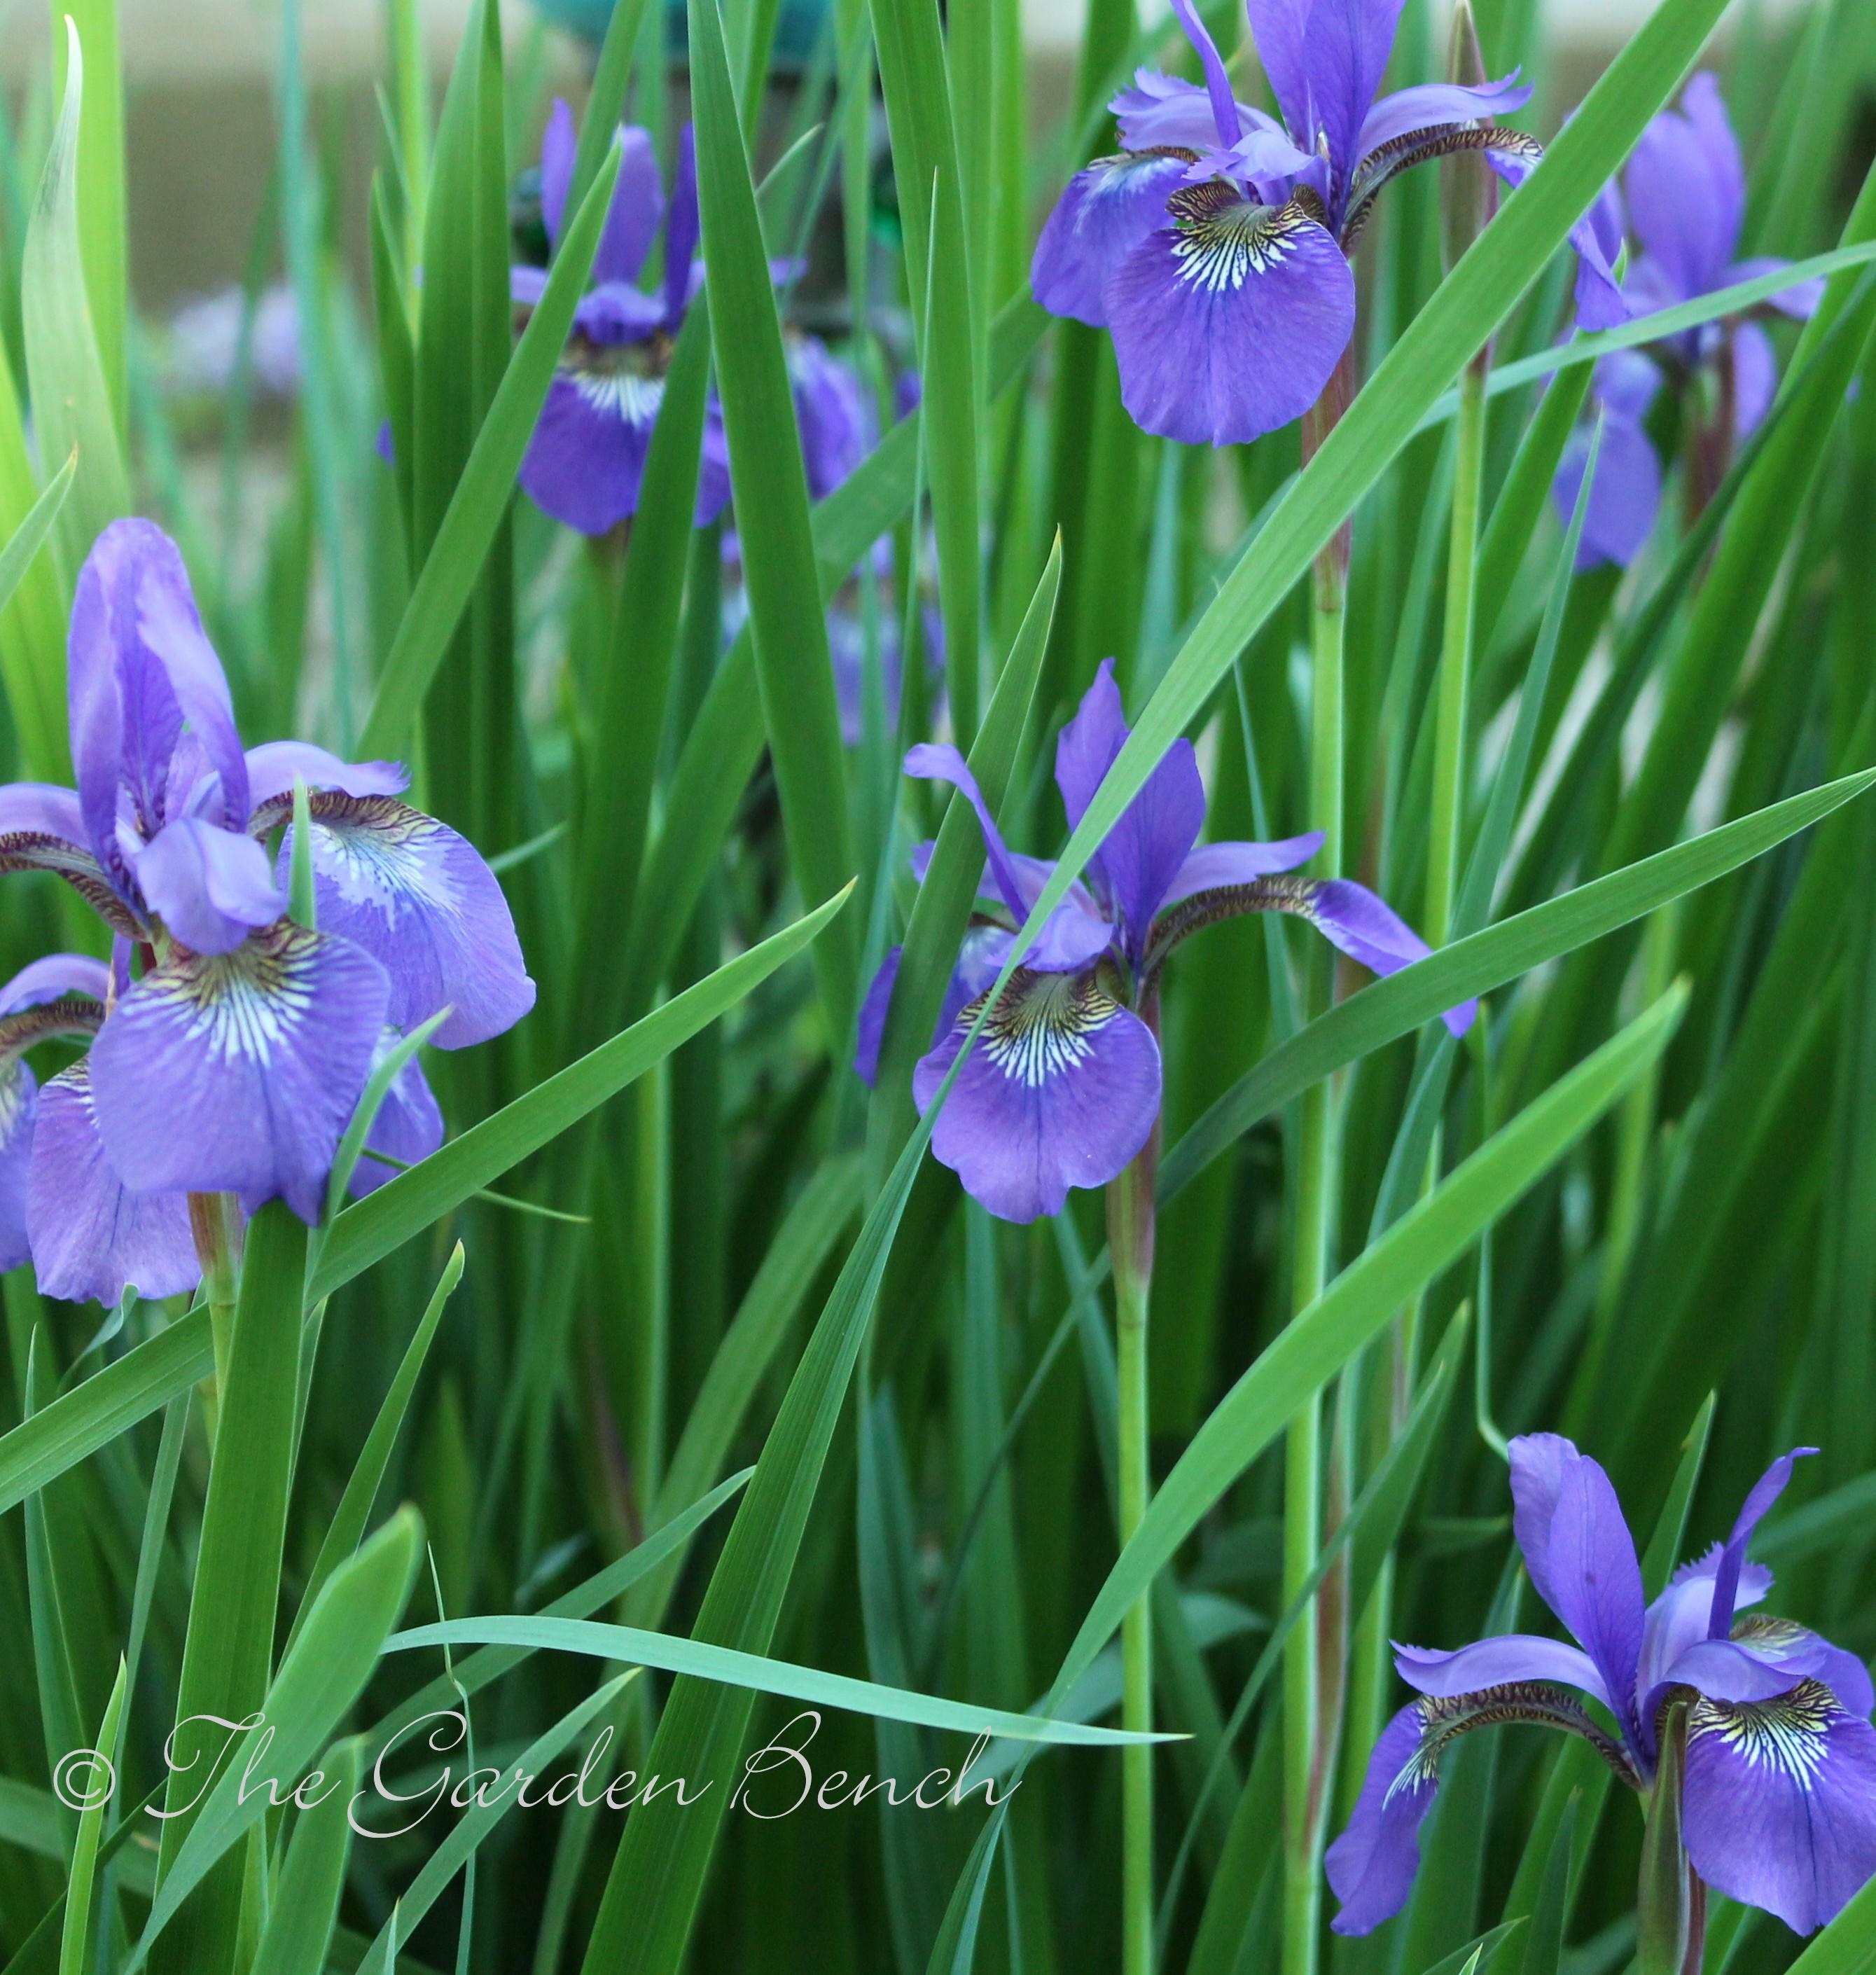 When Will Siberian Irises Bloom The Garden Bench